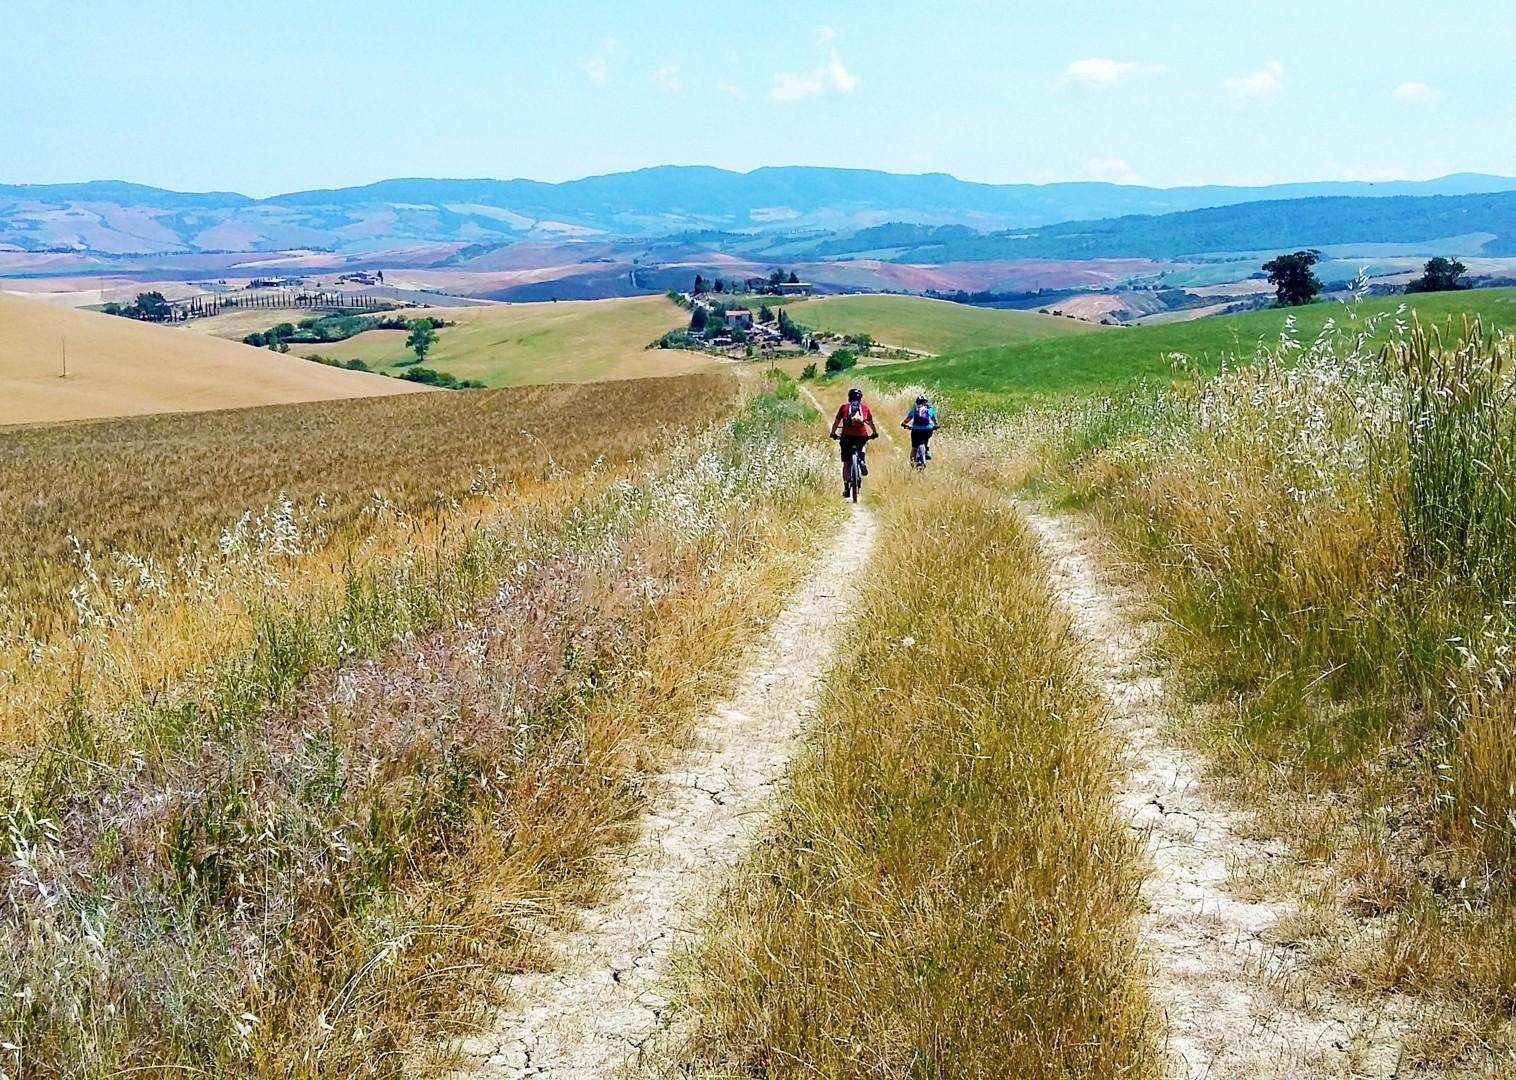 20170605_113843.jpg - Italy - Tuscany - Sacred Routes  - Self Guided Mountain Bike Holiday - Italia Mountain Biking